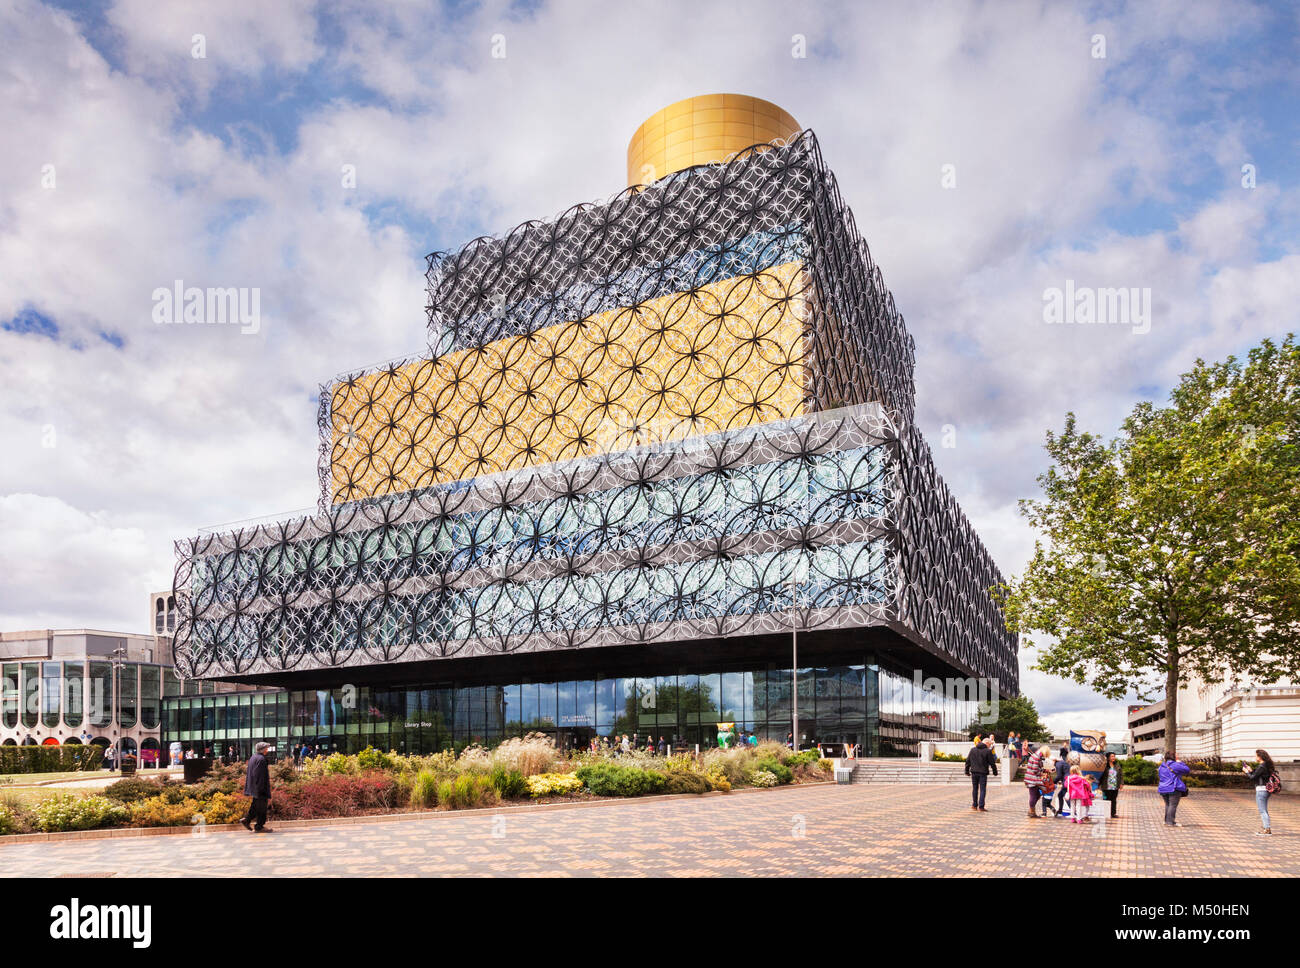 Birmingham Public Library, by Mecanoo, Birmingham, West Midlands, England - Stock Image